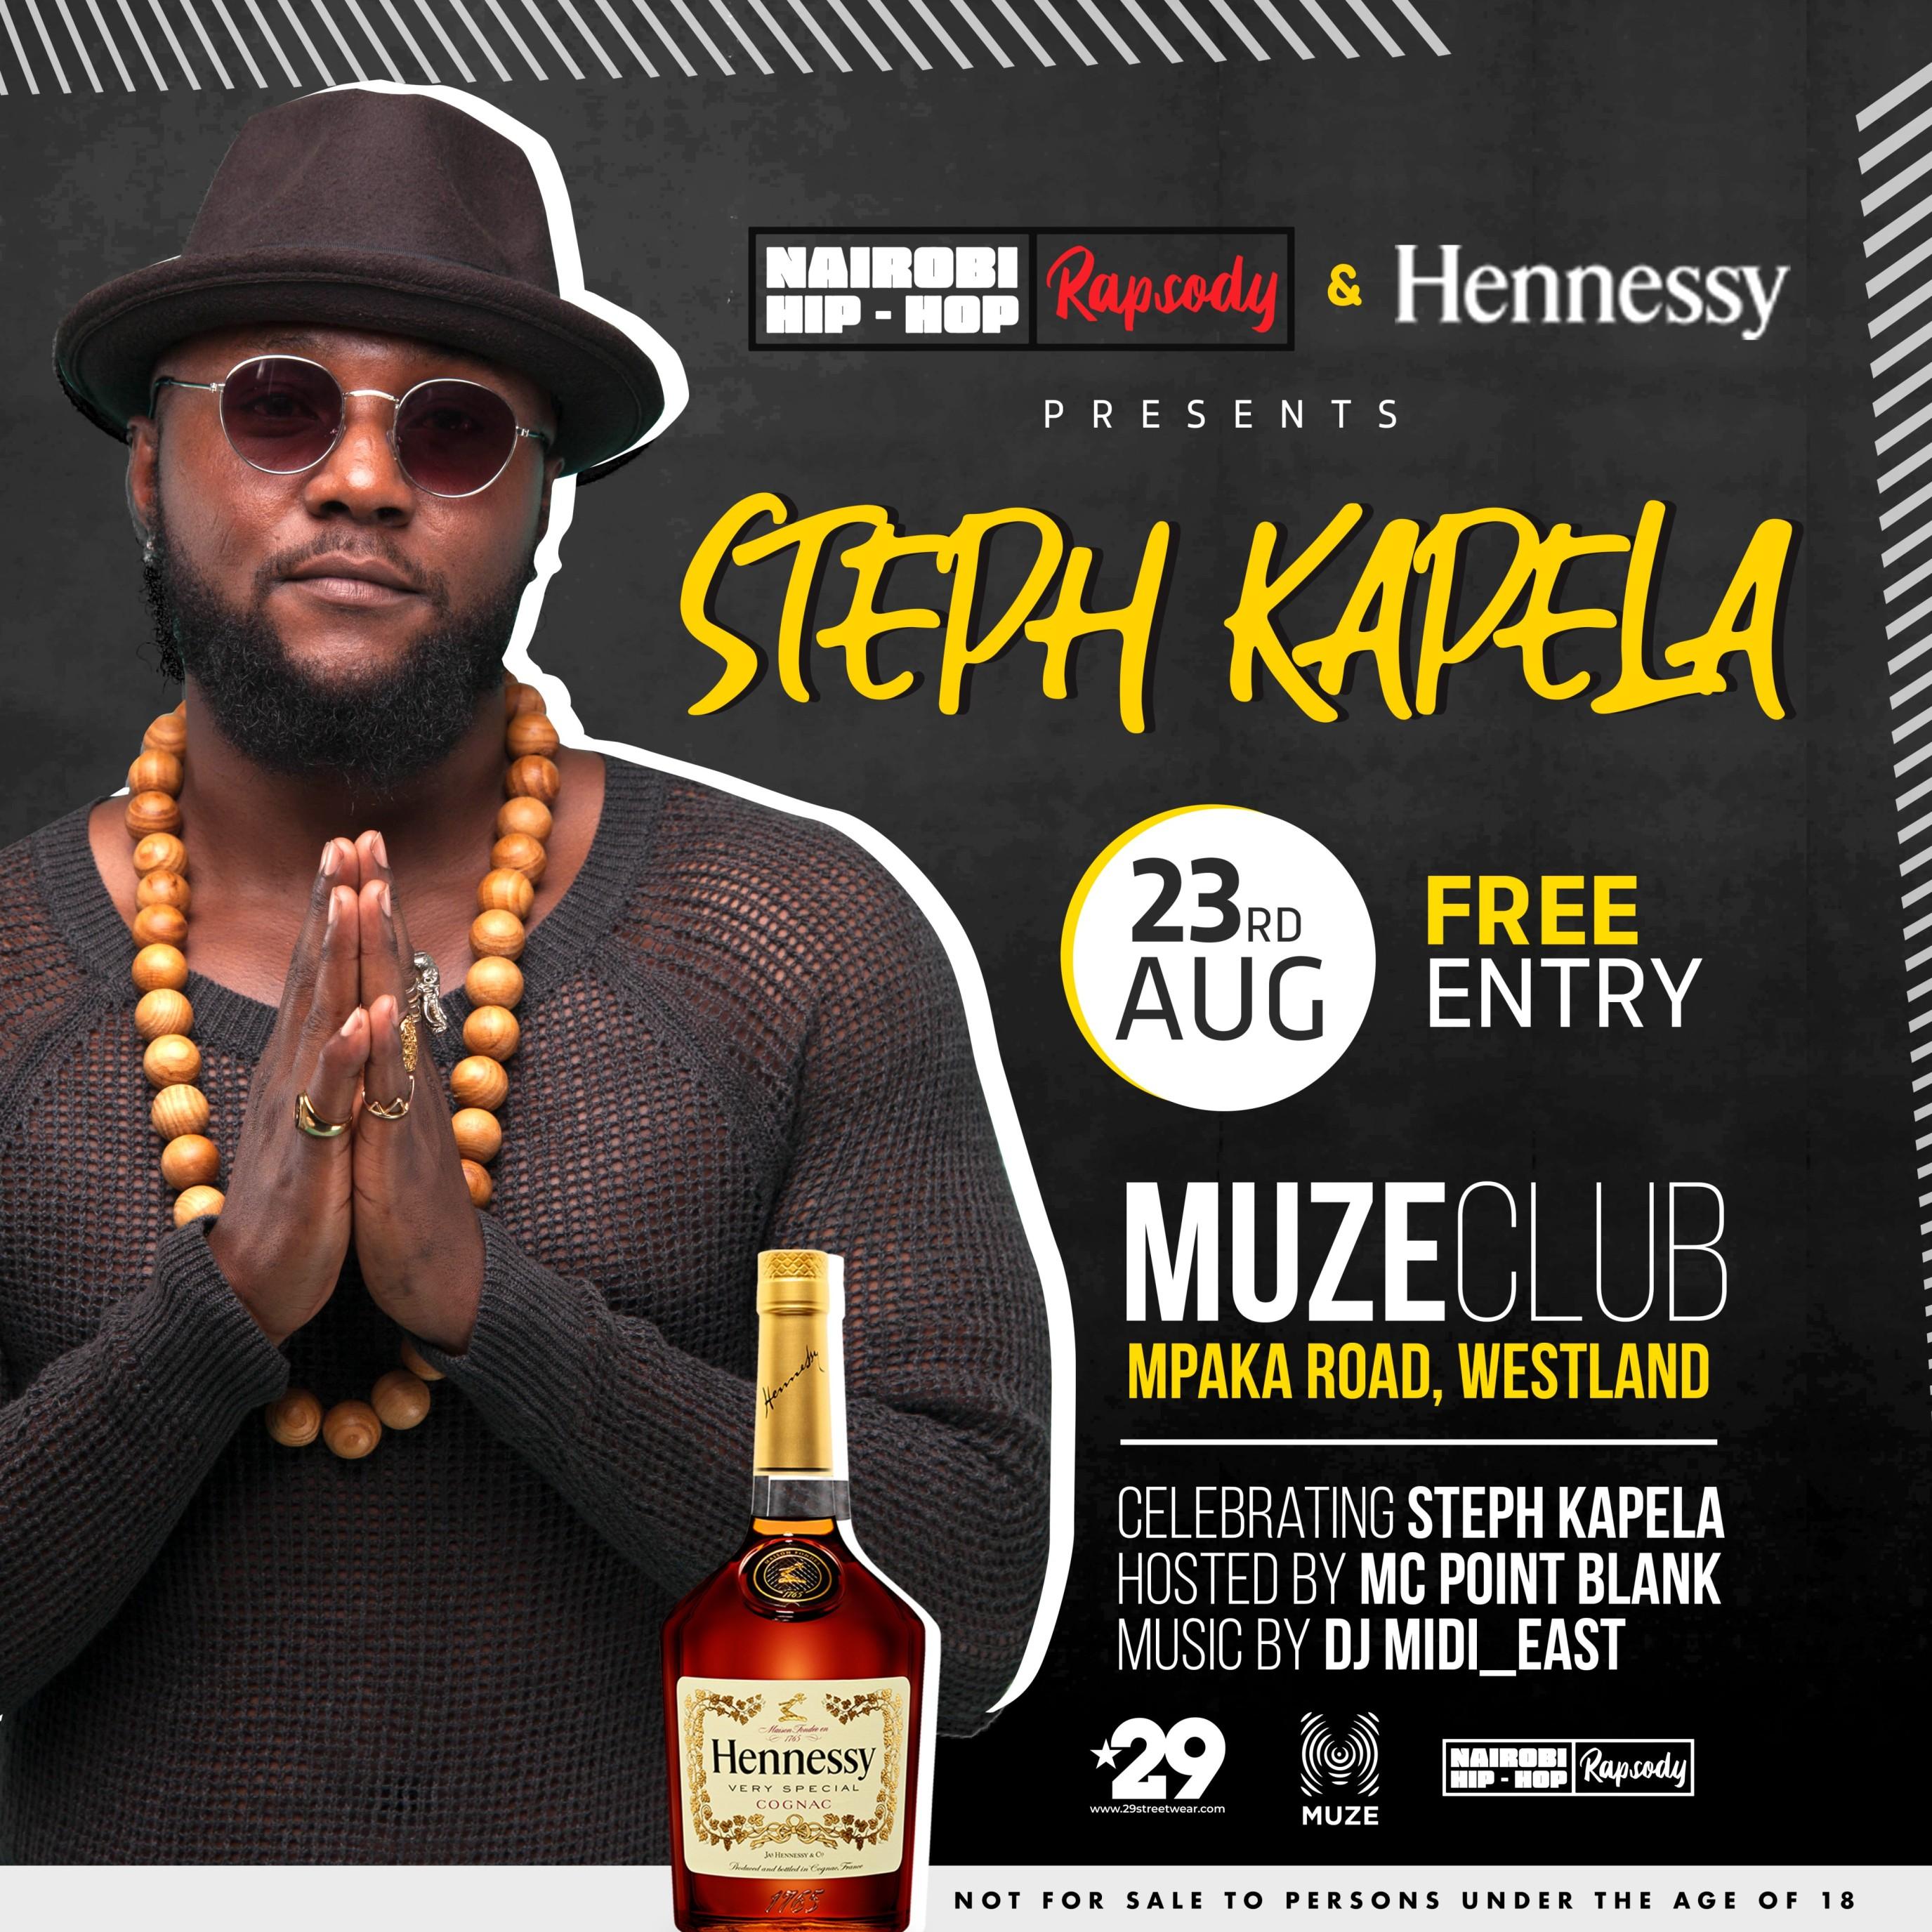 The Hennessy Artistry presesnts Steph Kapela